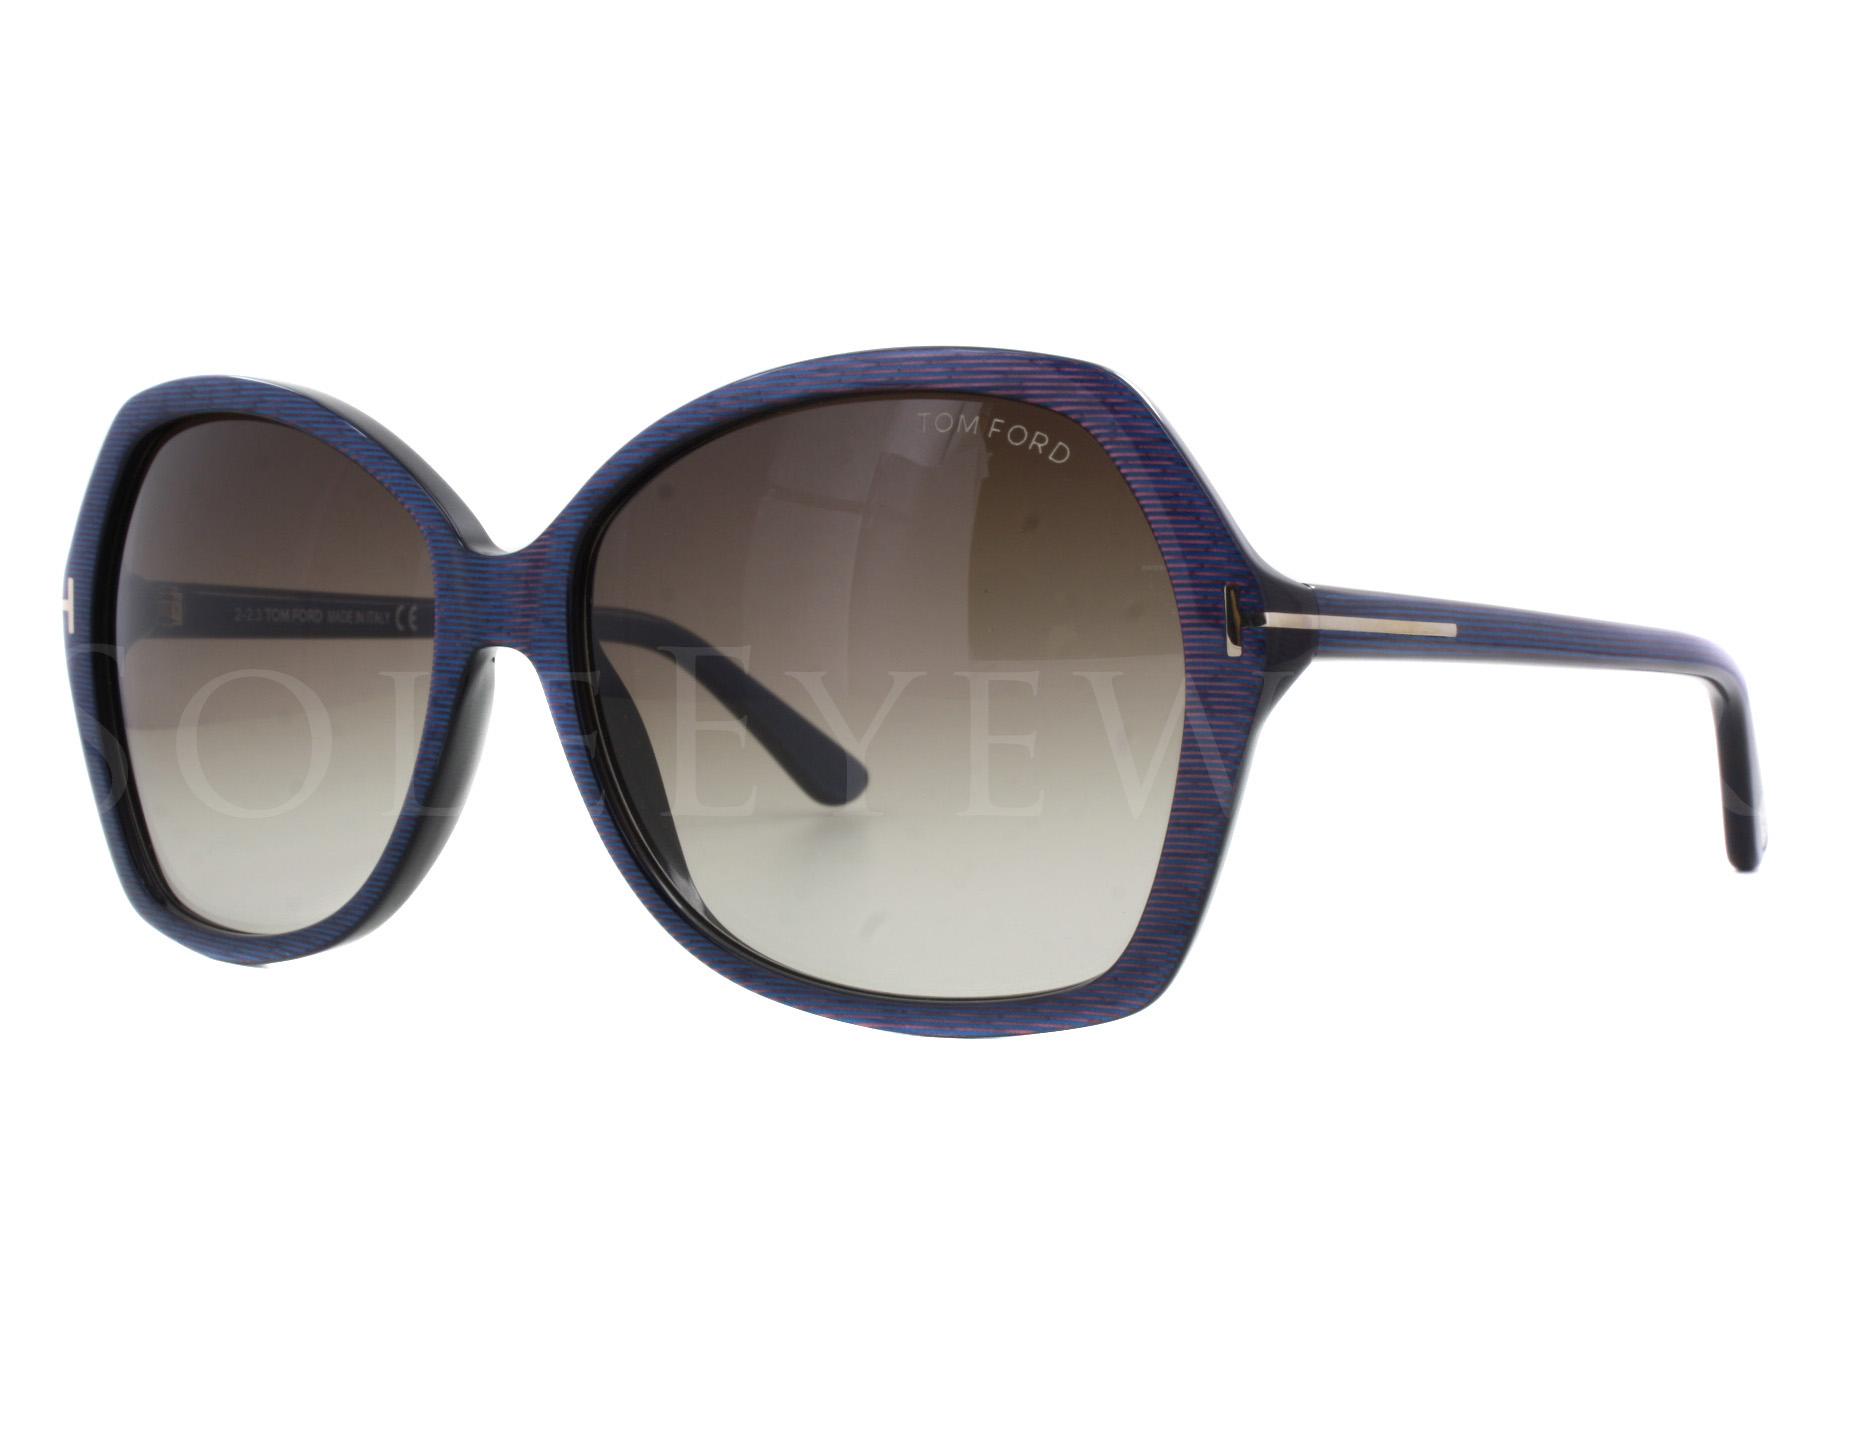 Sonnenbrille Carola (FT0328) Tom Ford yE8zOXyE